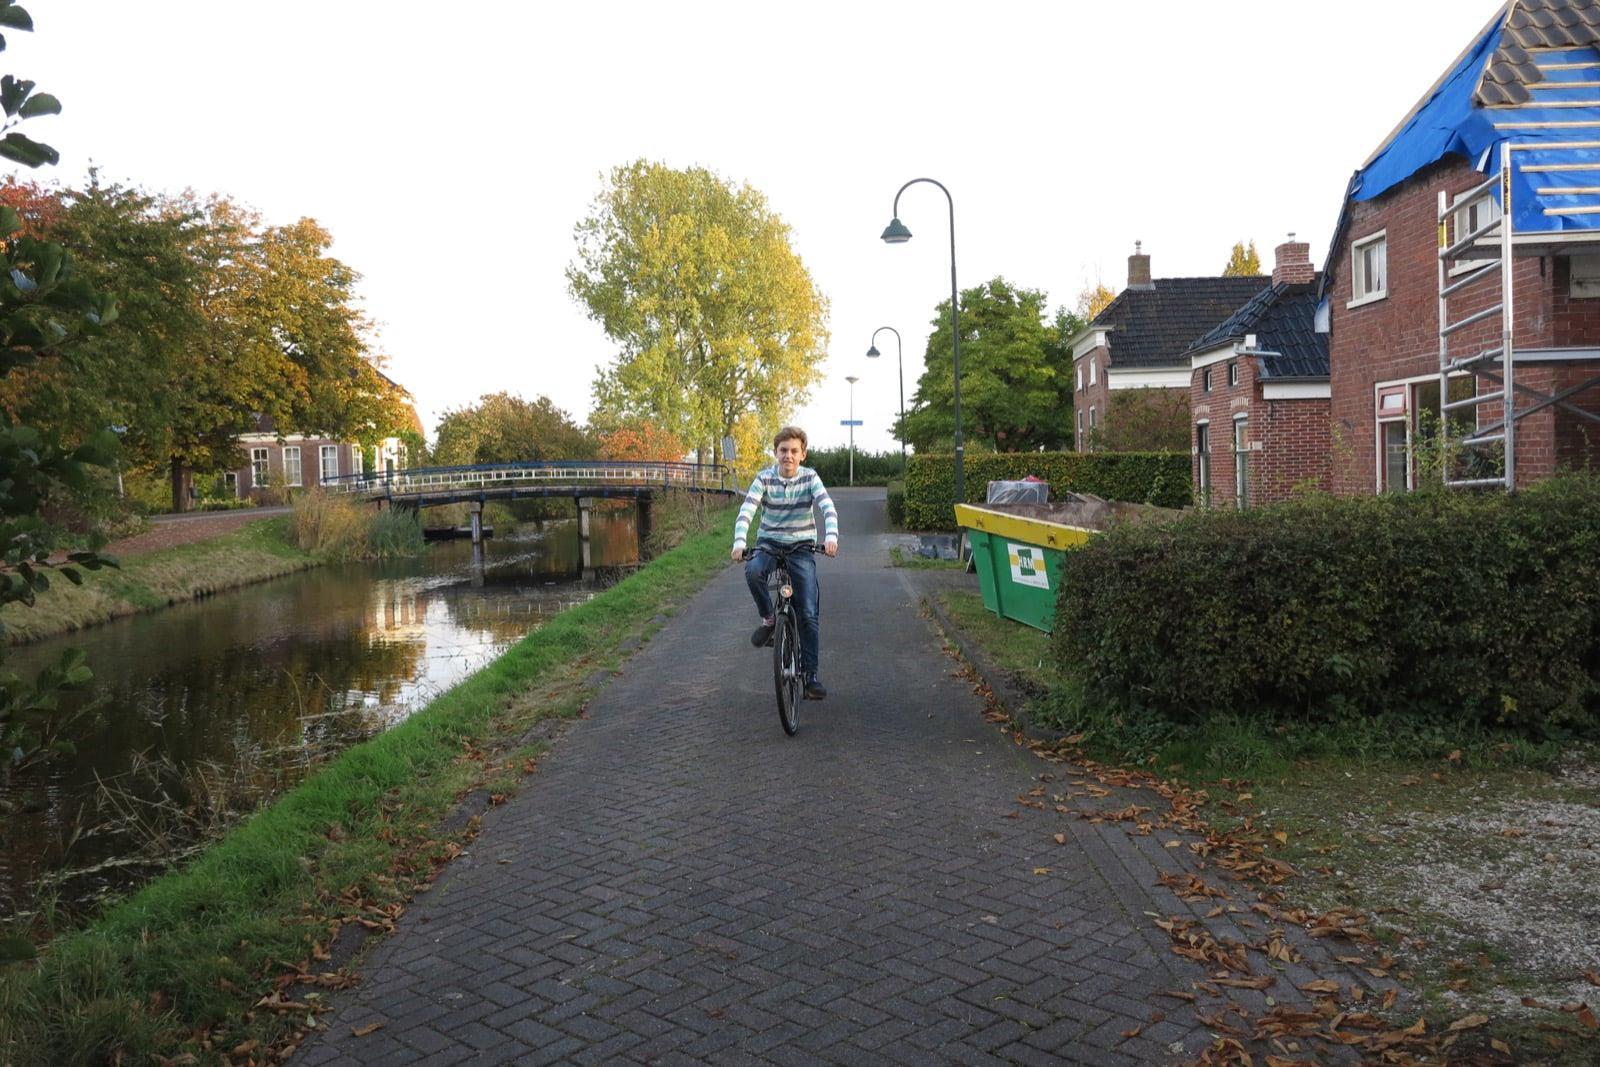 et-fiets-en-fietser-90-ale-ten-cate---de-dijk-3-oi.jpg